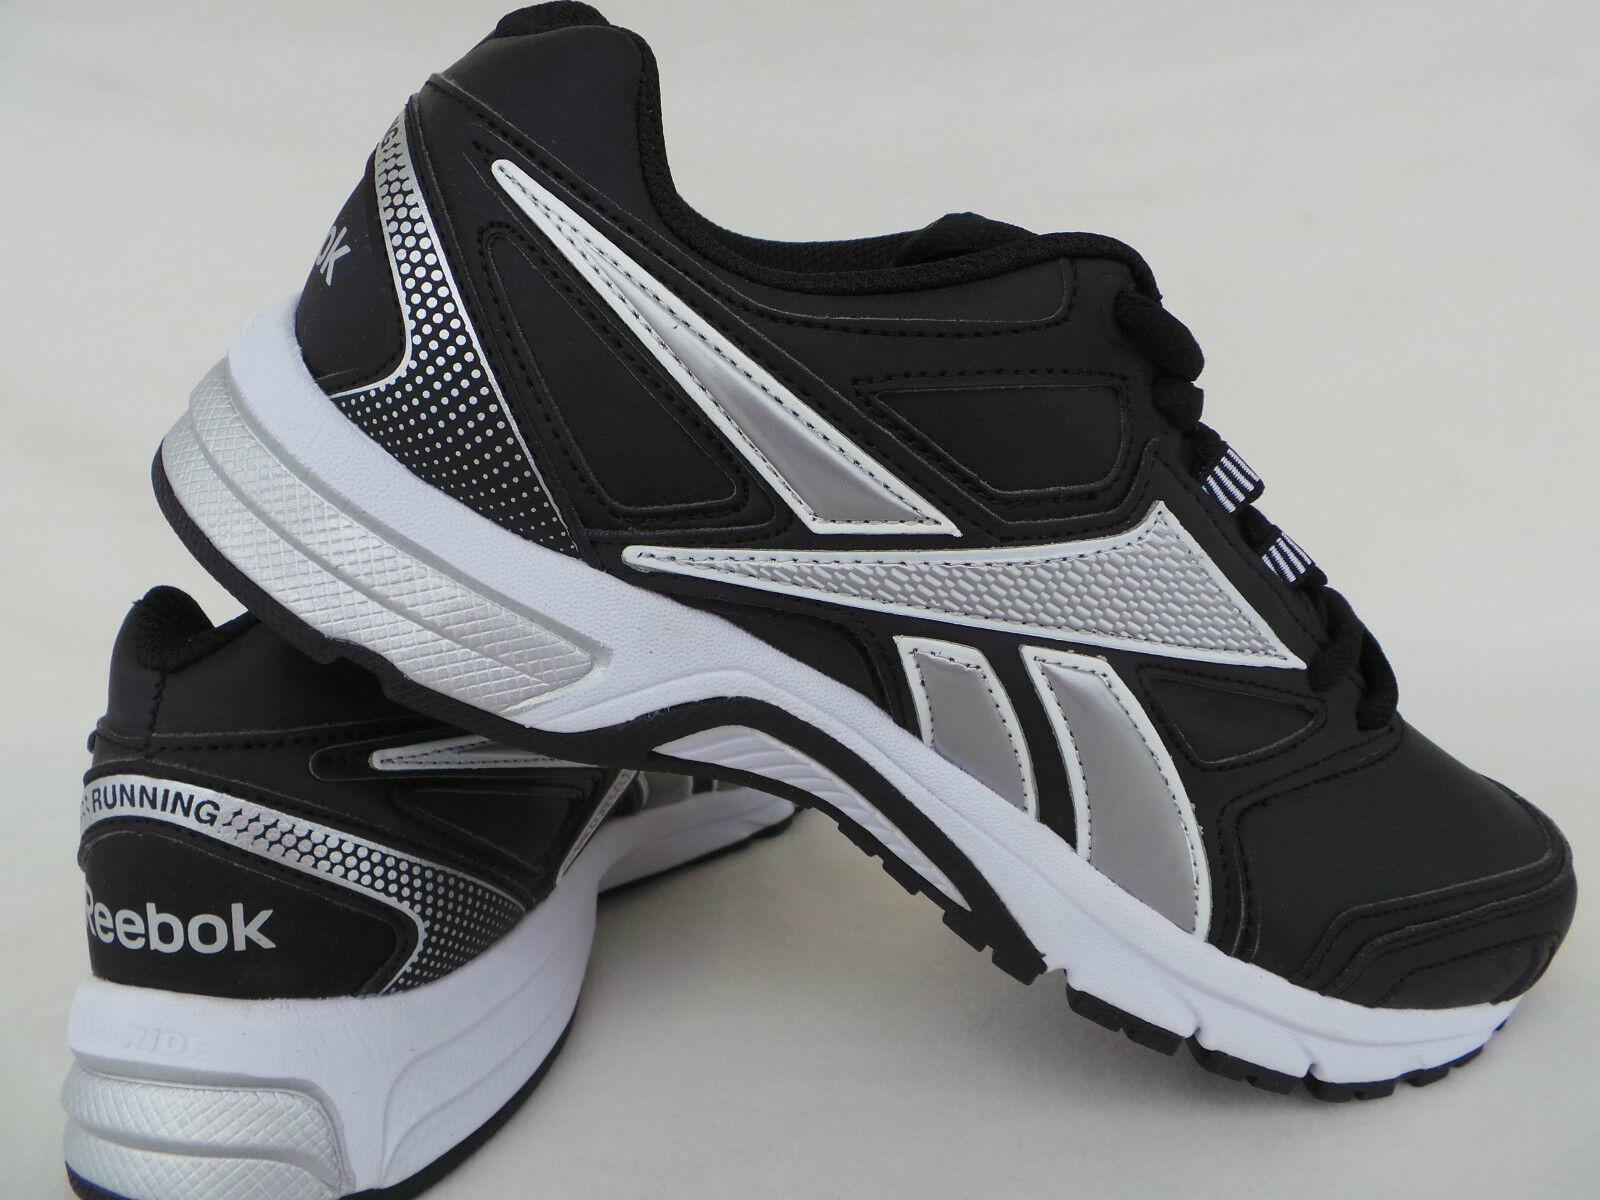 REEBOK  JOGGING LAUF SCHUH RUNNING RUNNING RUNNING SPORT FITNESS Turnschuhe Gr 40 41 42 43 44  5 45 262b66